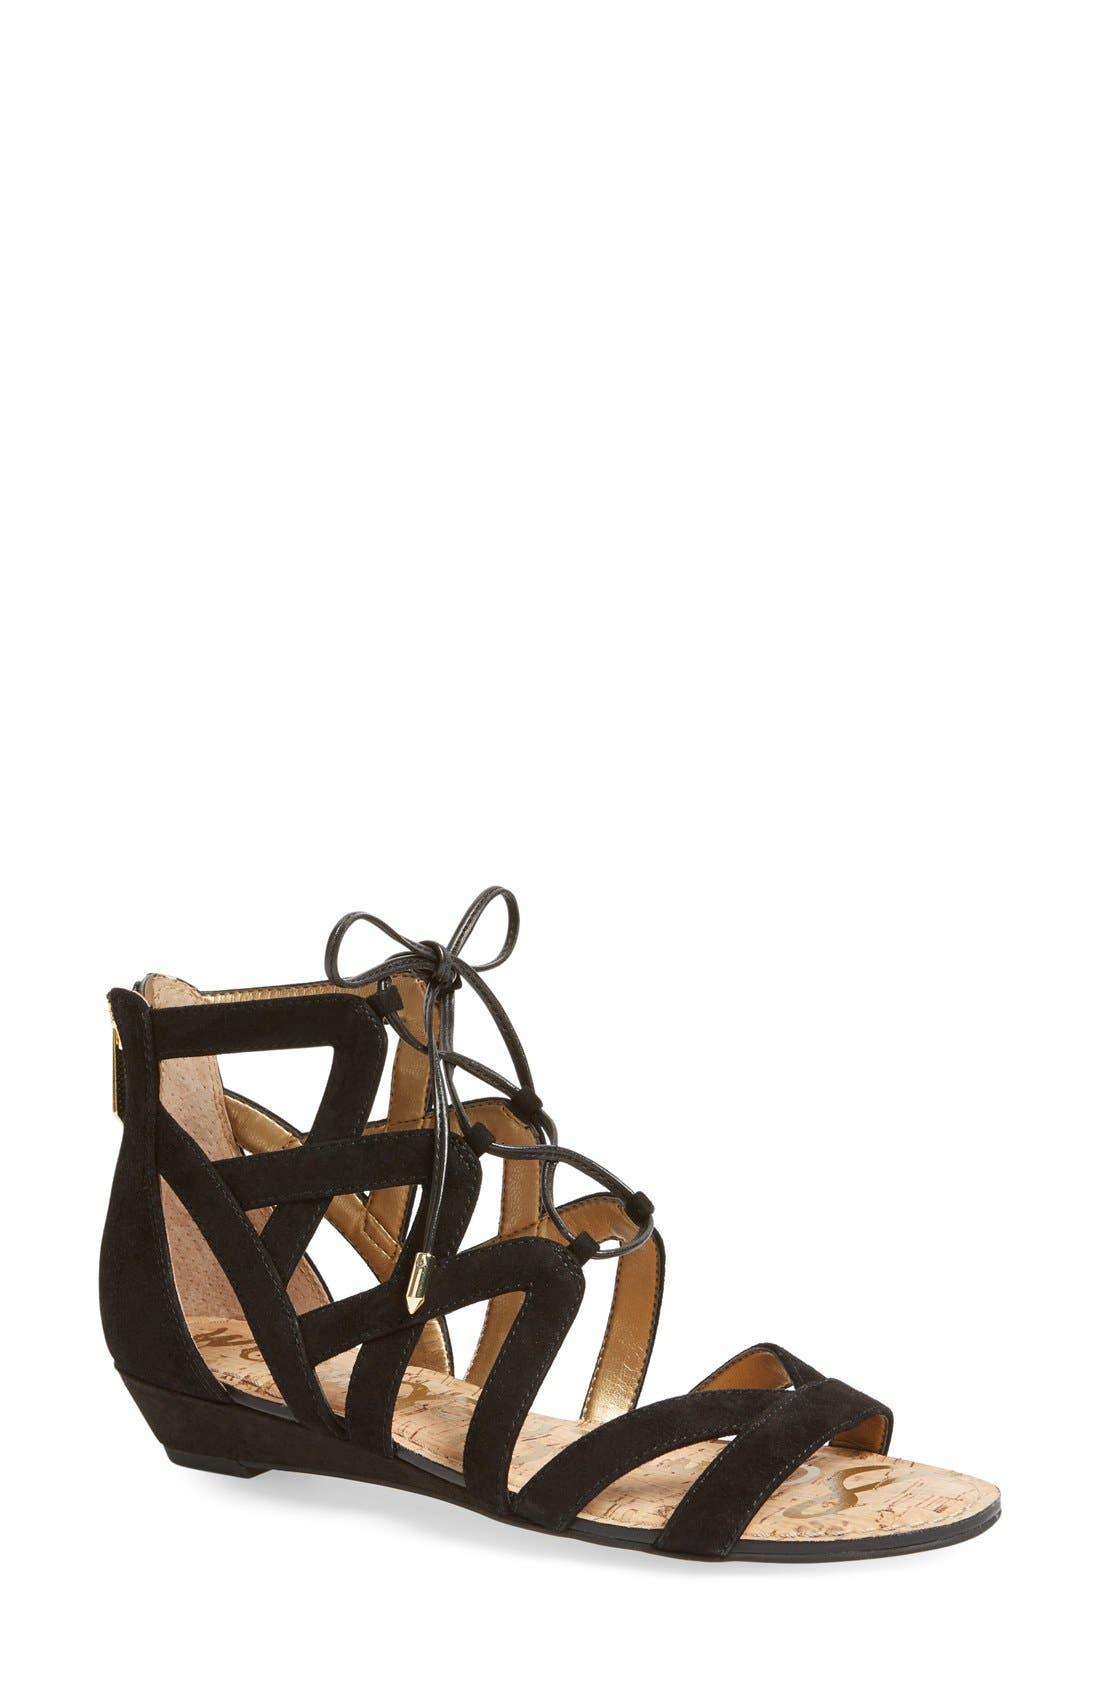 'Dawson' Ghillie Sandal, Main, color, 001